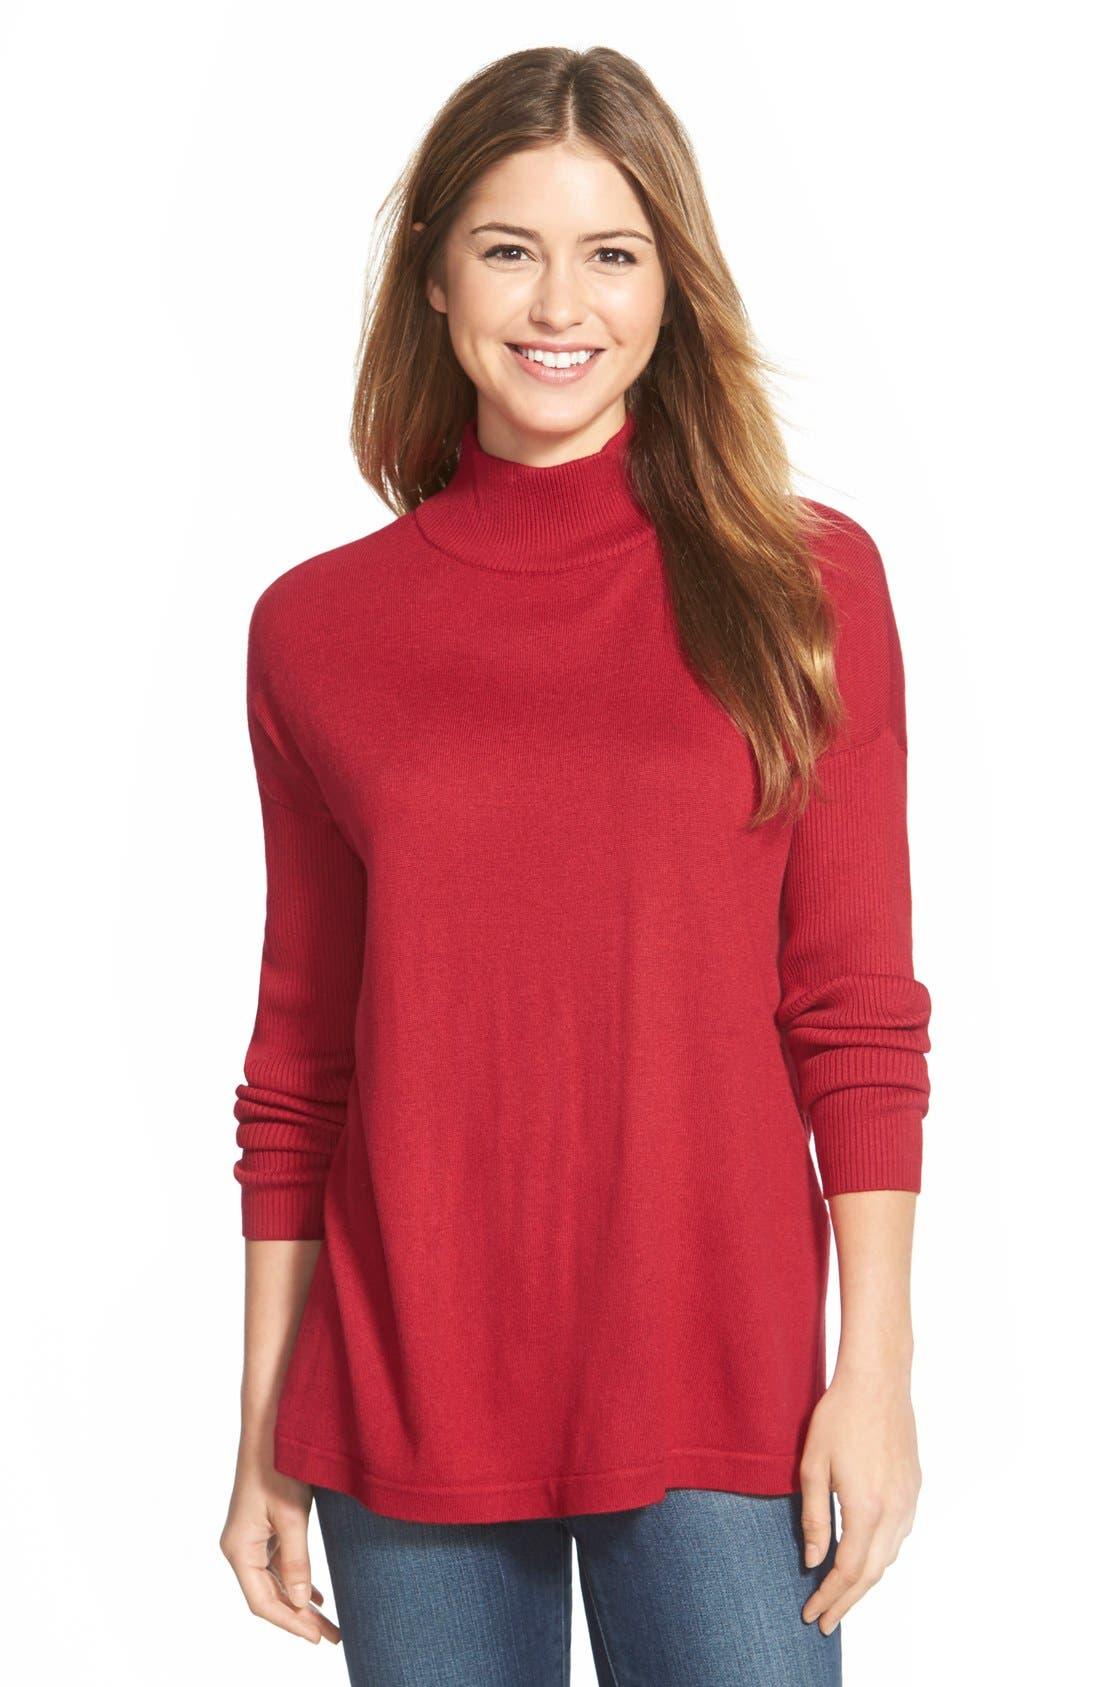 Alternate Image 1 Selected - Vince CamutoRibbed Sleeve Mock Neck Sweater (Regular & Petite)